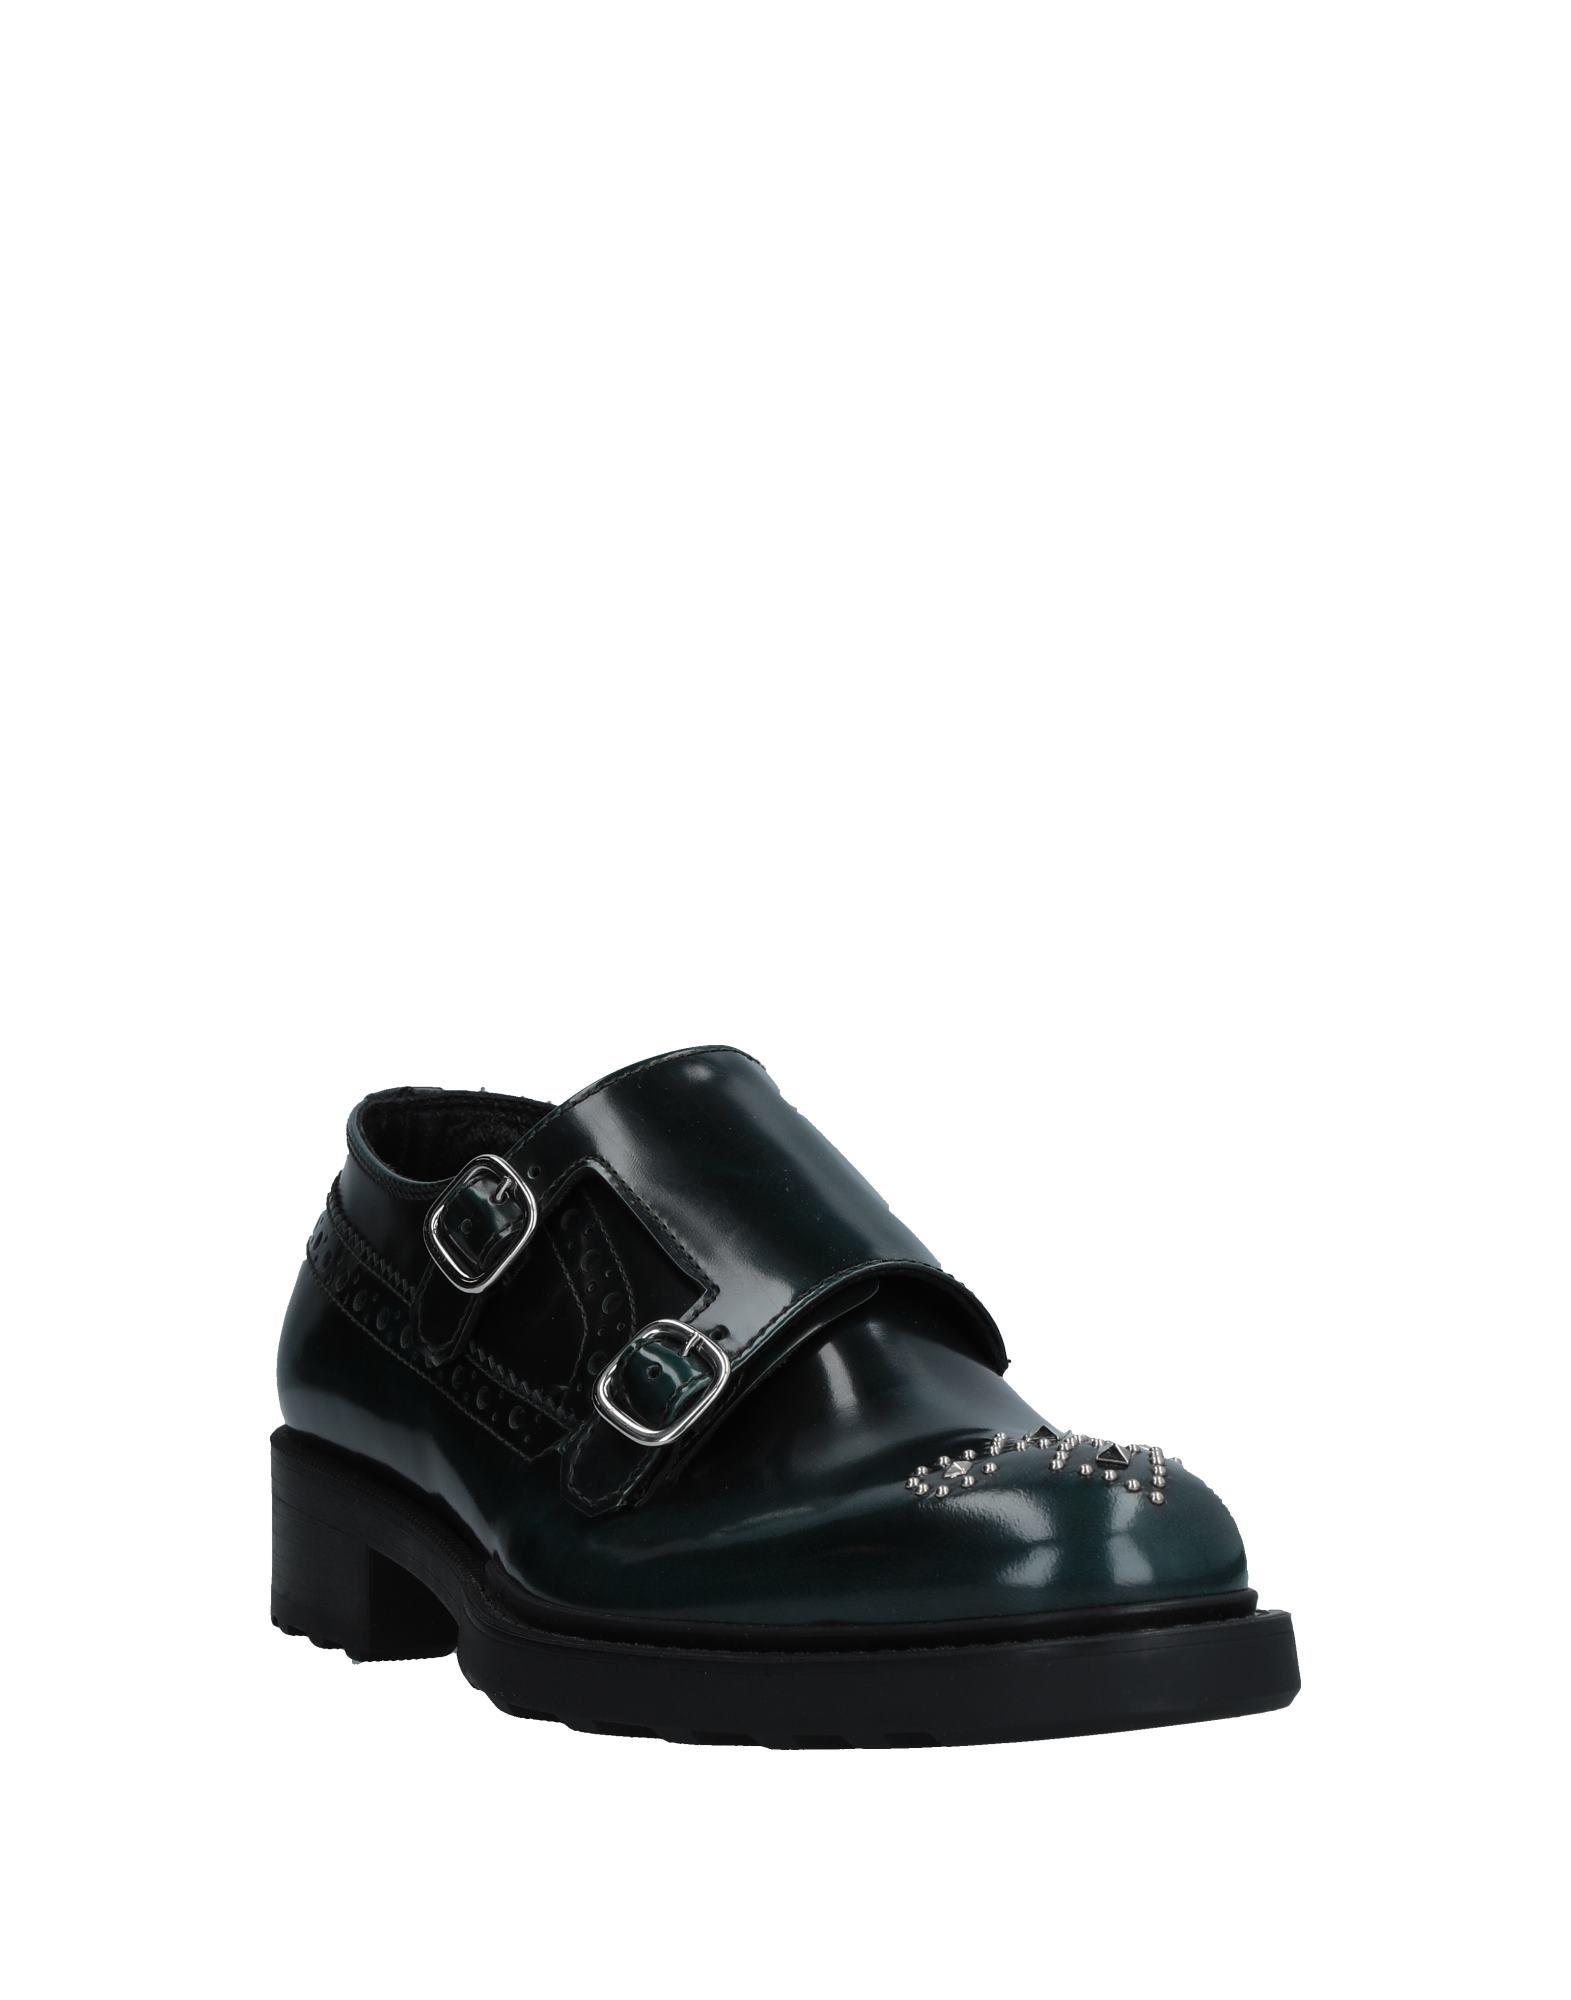 Stilvolle billige Schuhe Damen Barracuda Mokassins Damen Schuhe  11536349GB 283ac7